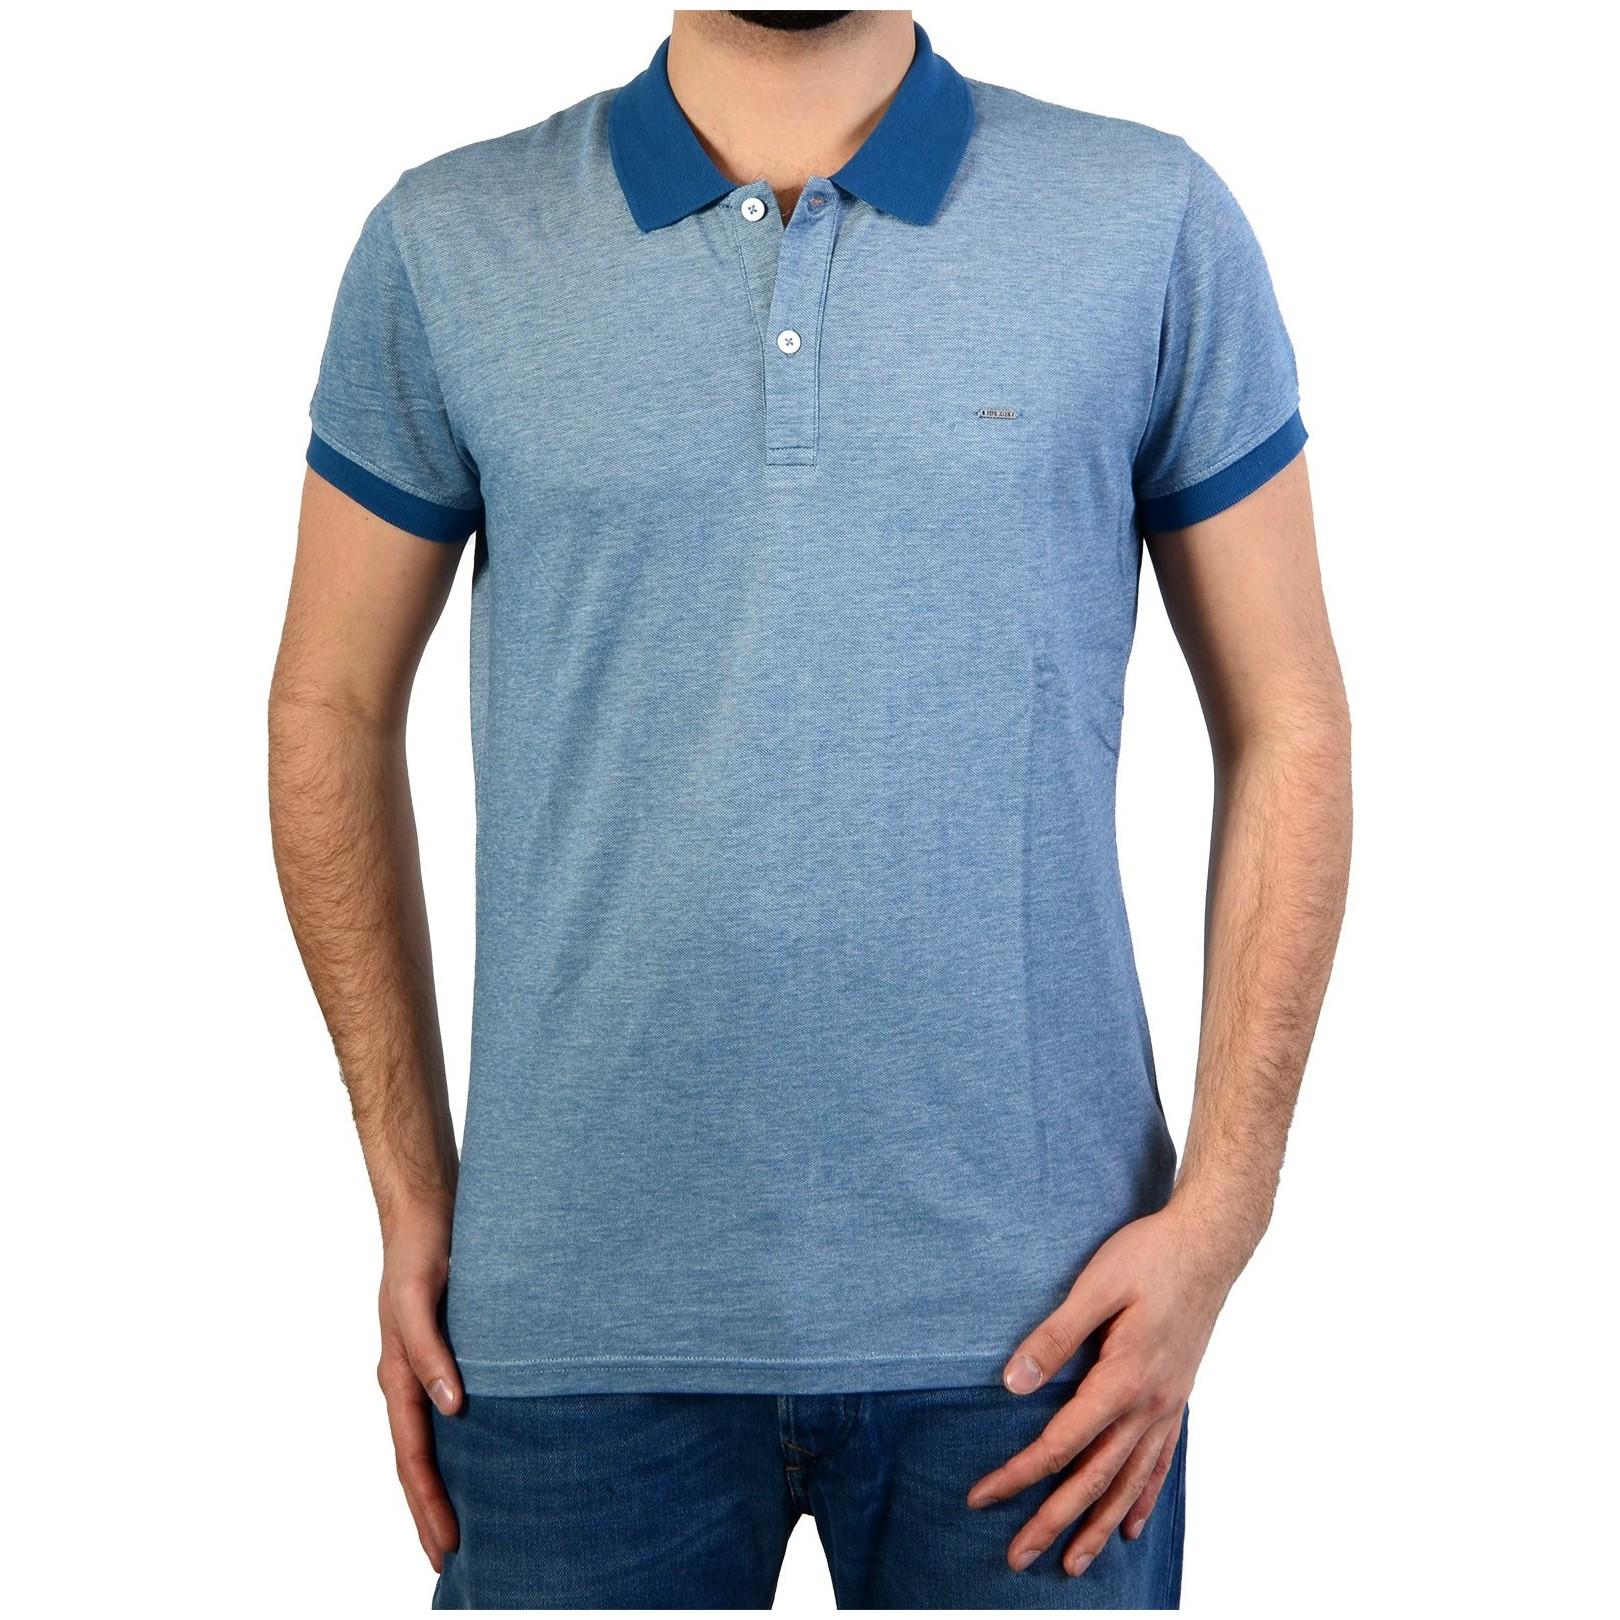 Polo Pepe Jeans Mason Pm540687 554 Electric Blue